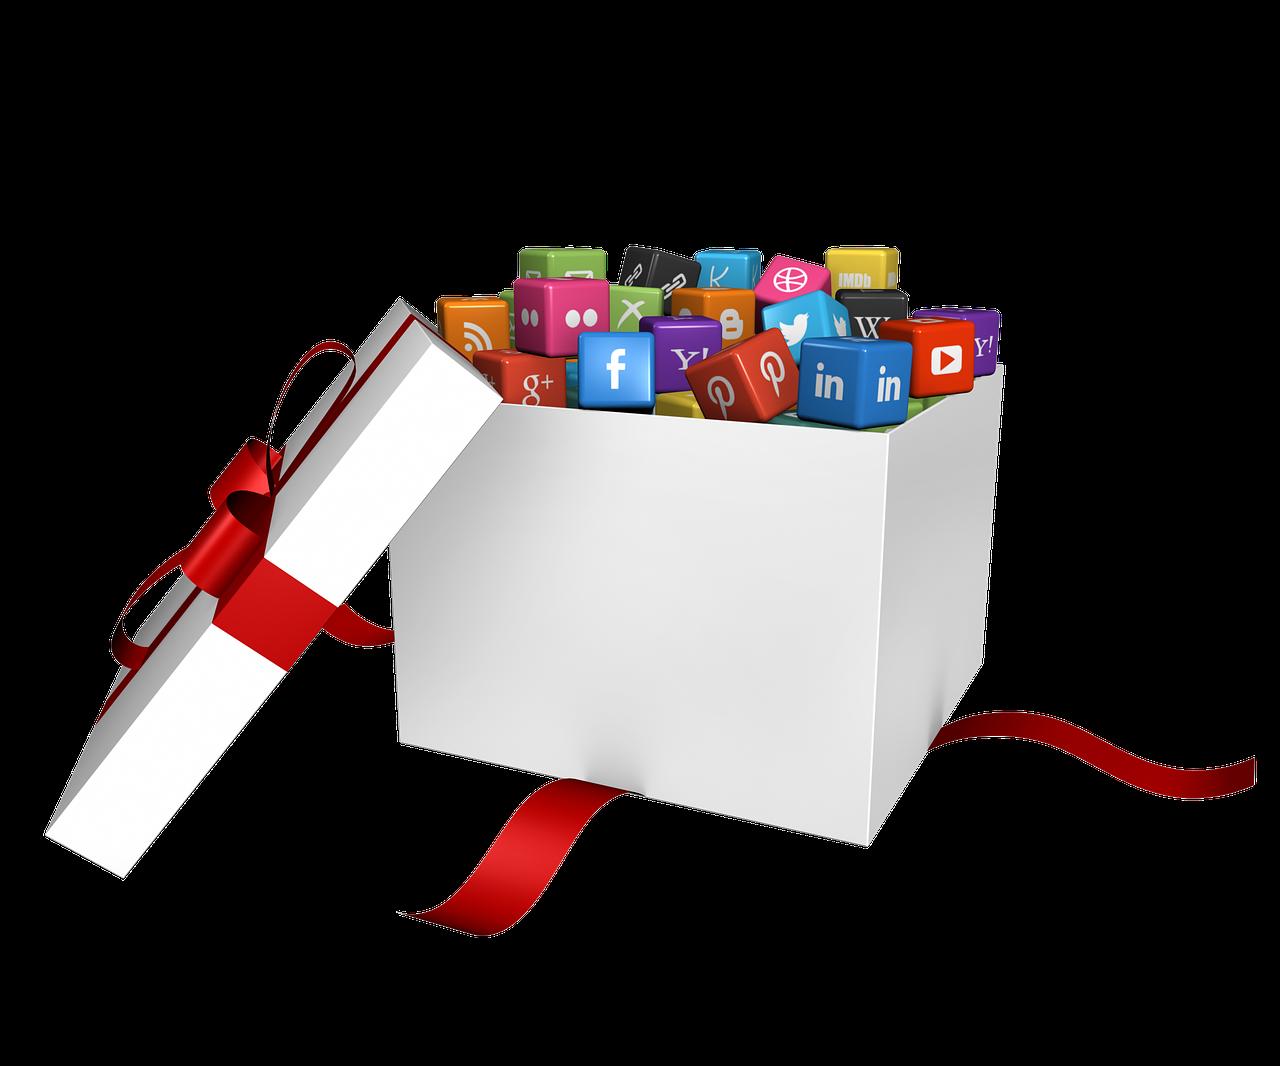 social-media-hashimoto-guide